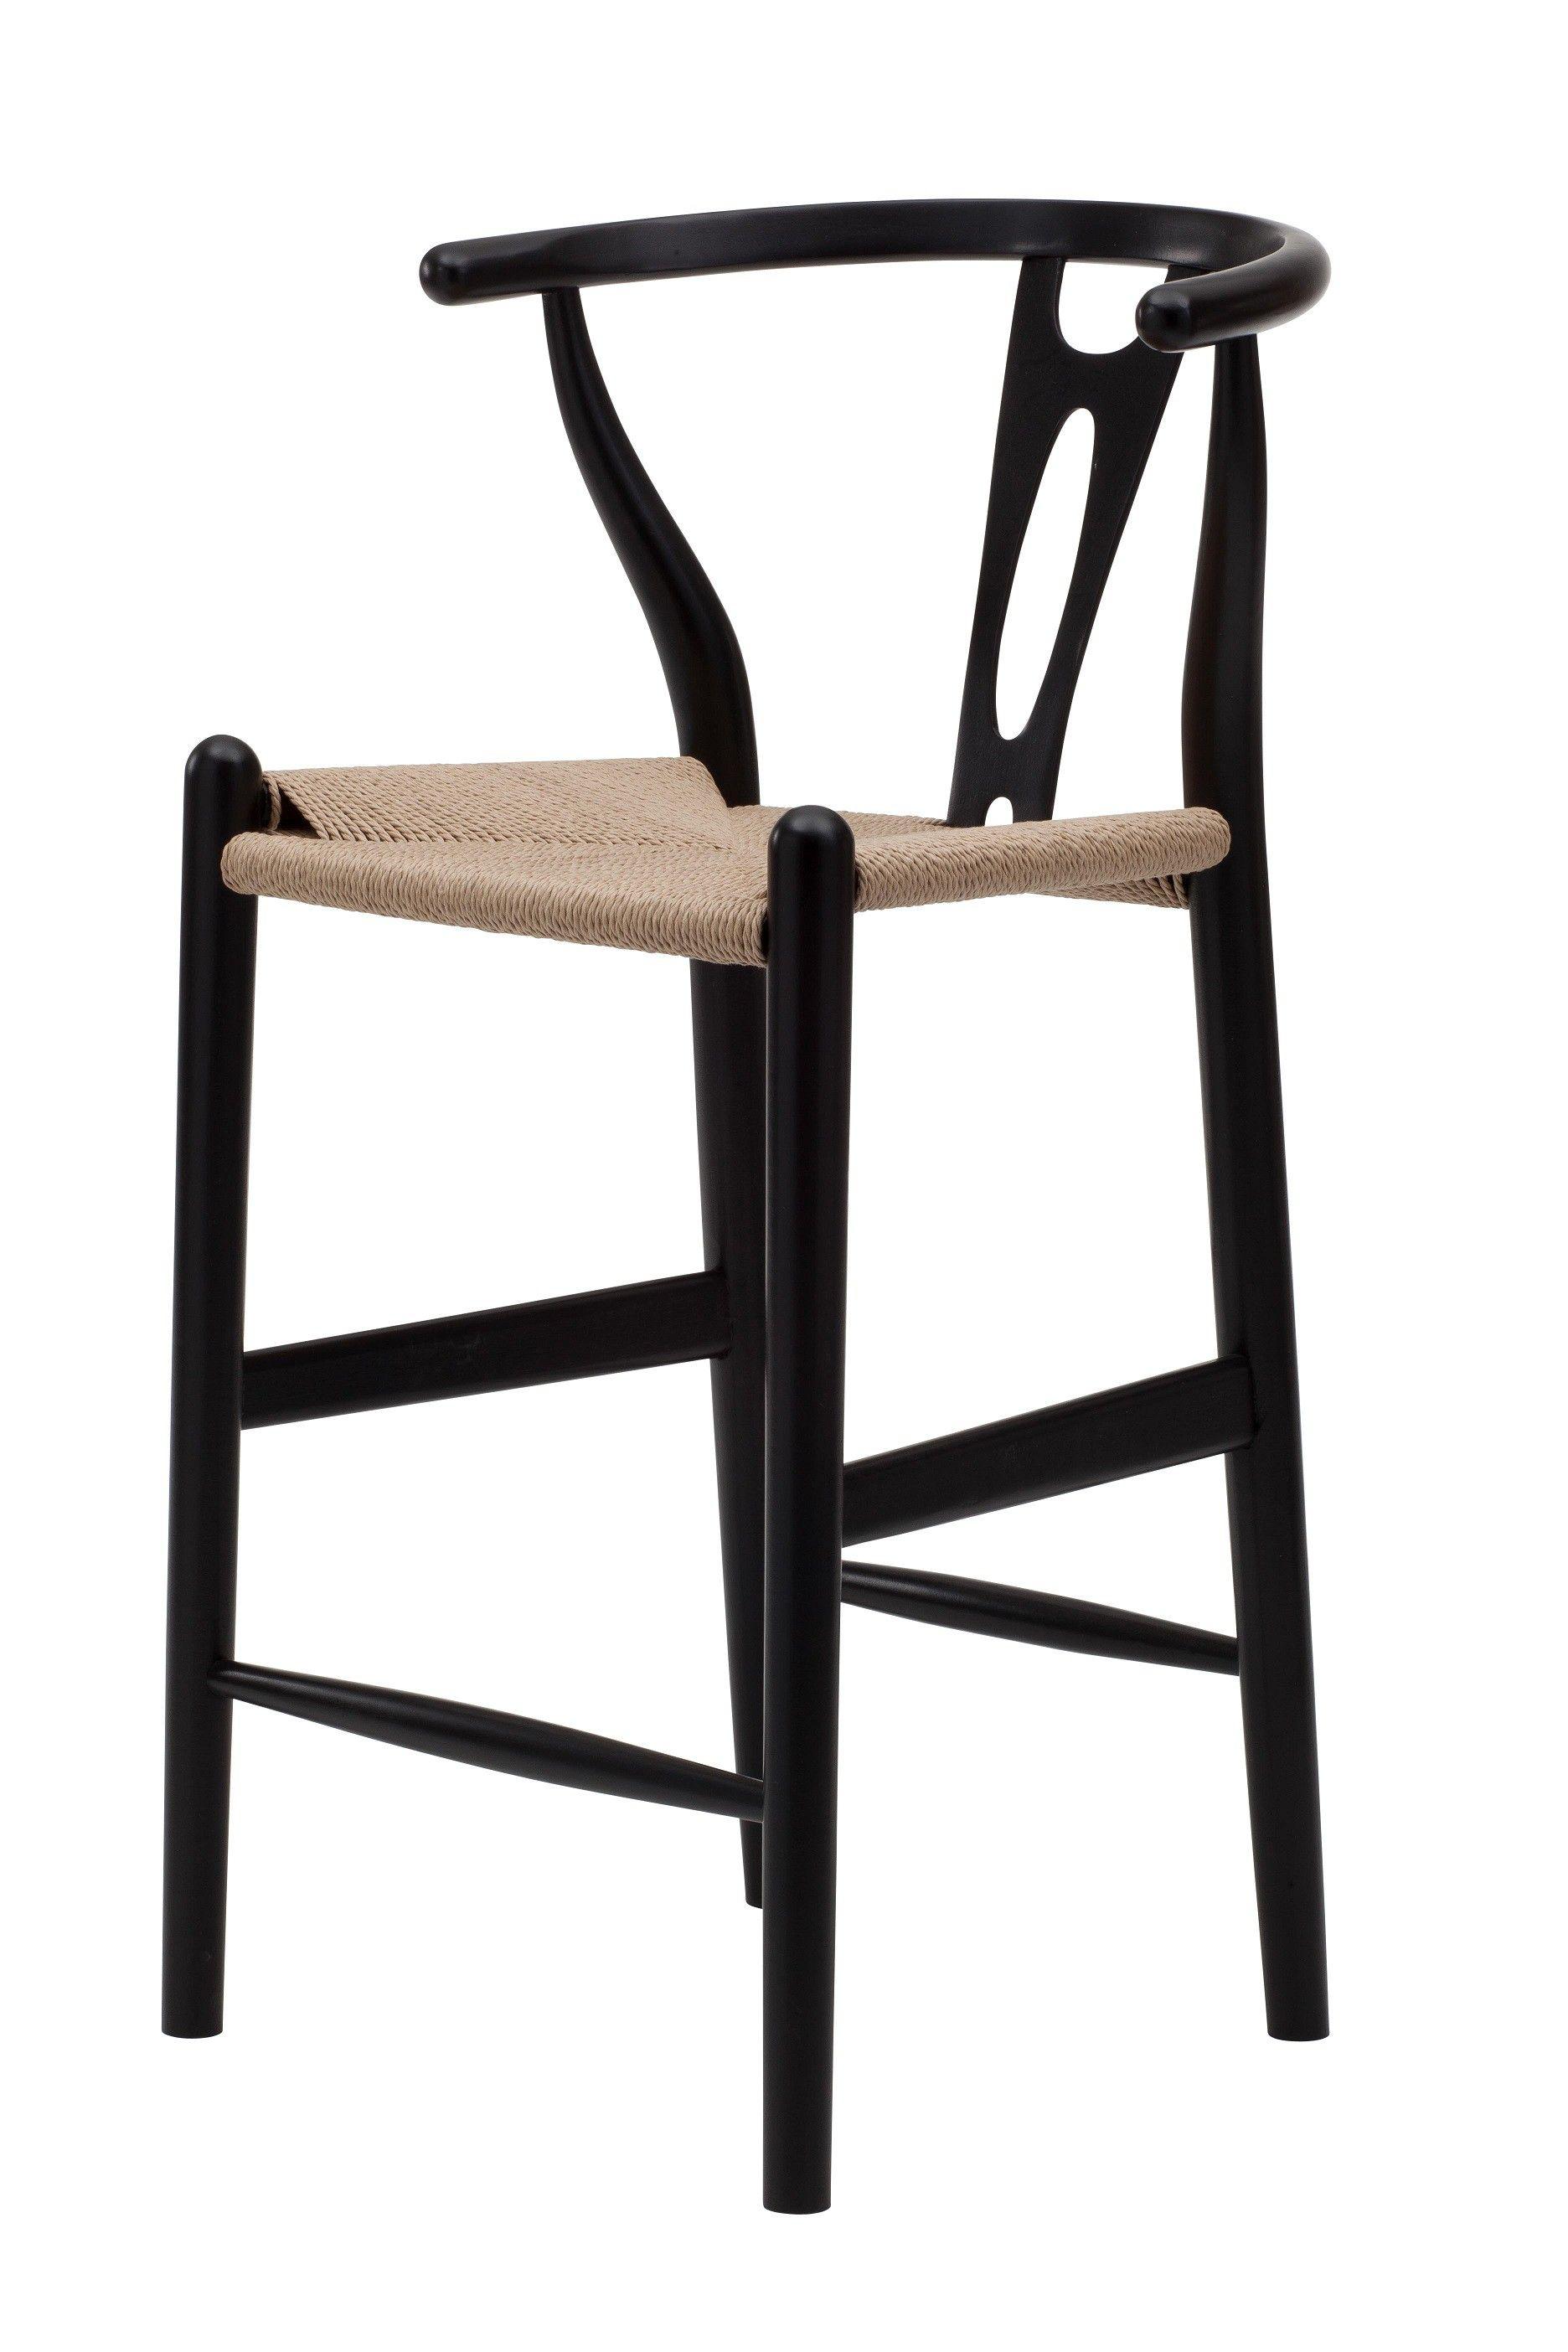 189 Hans Wegner wishbone replica stool Bar stools